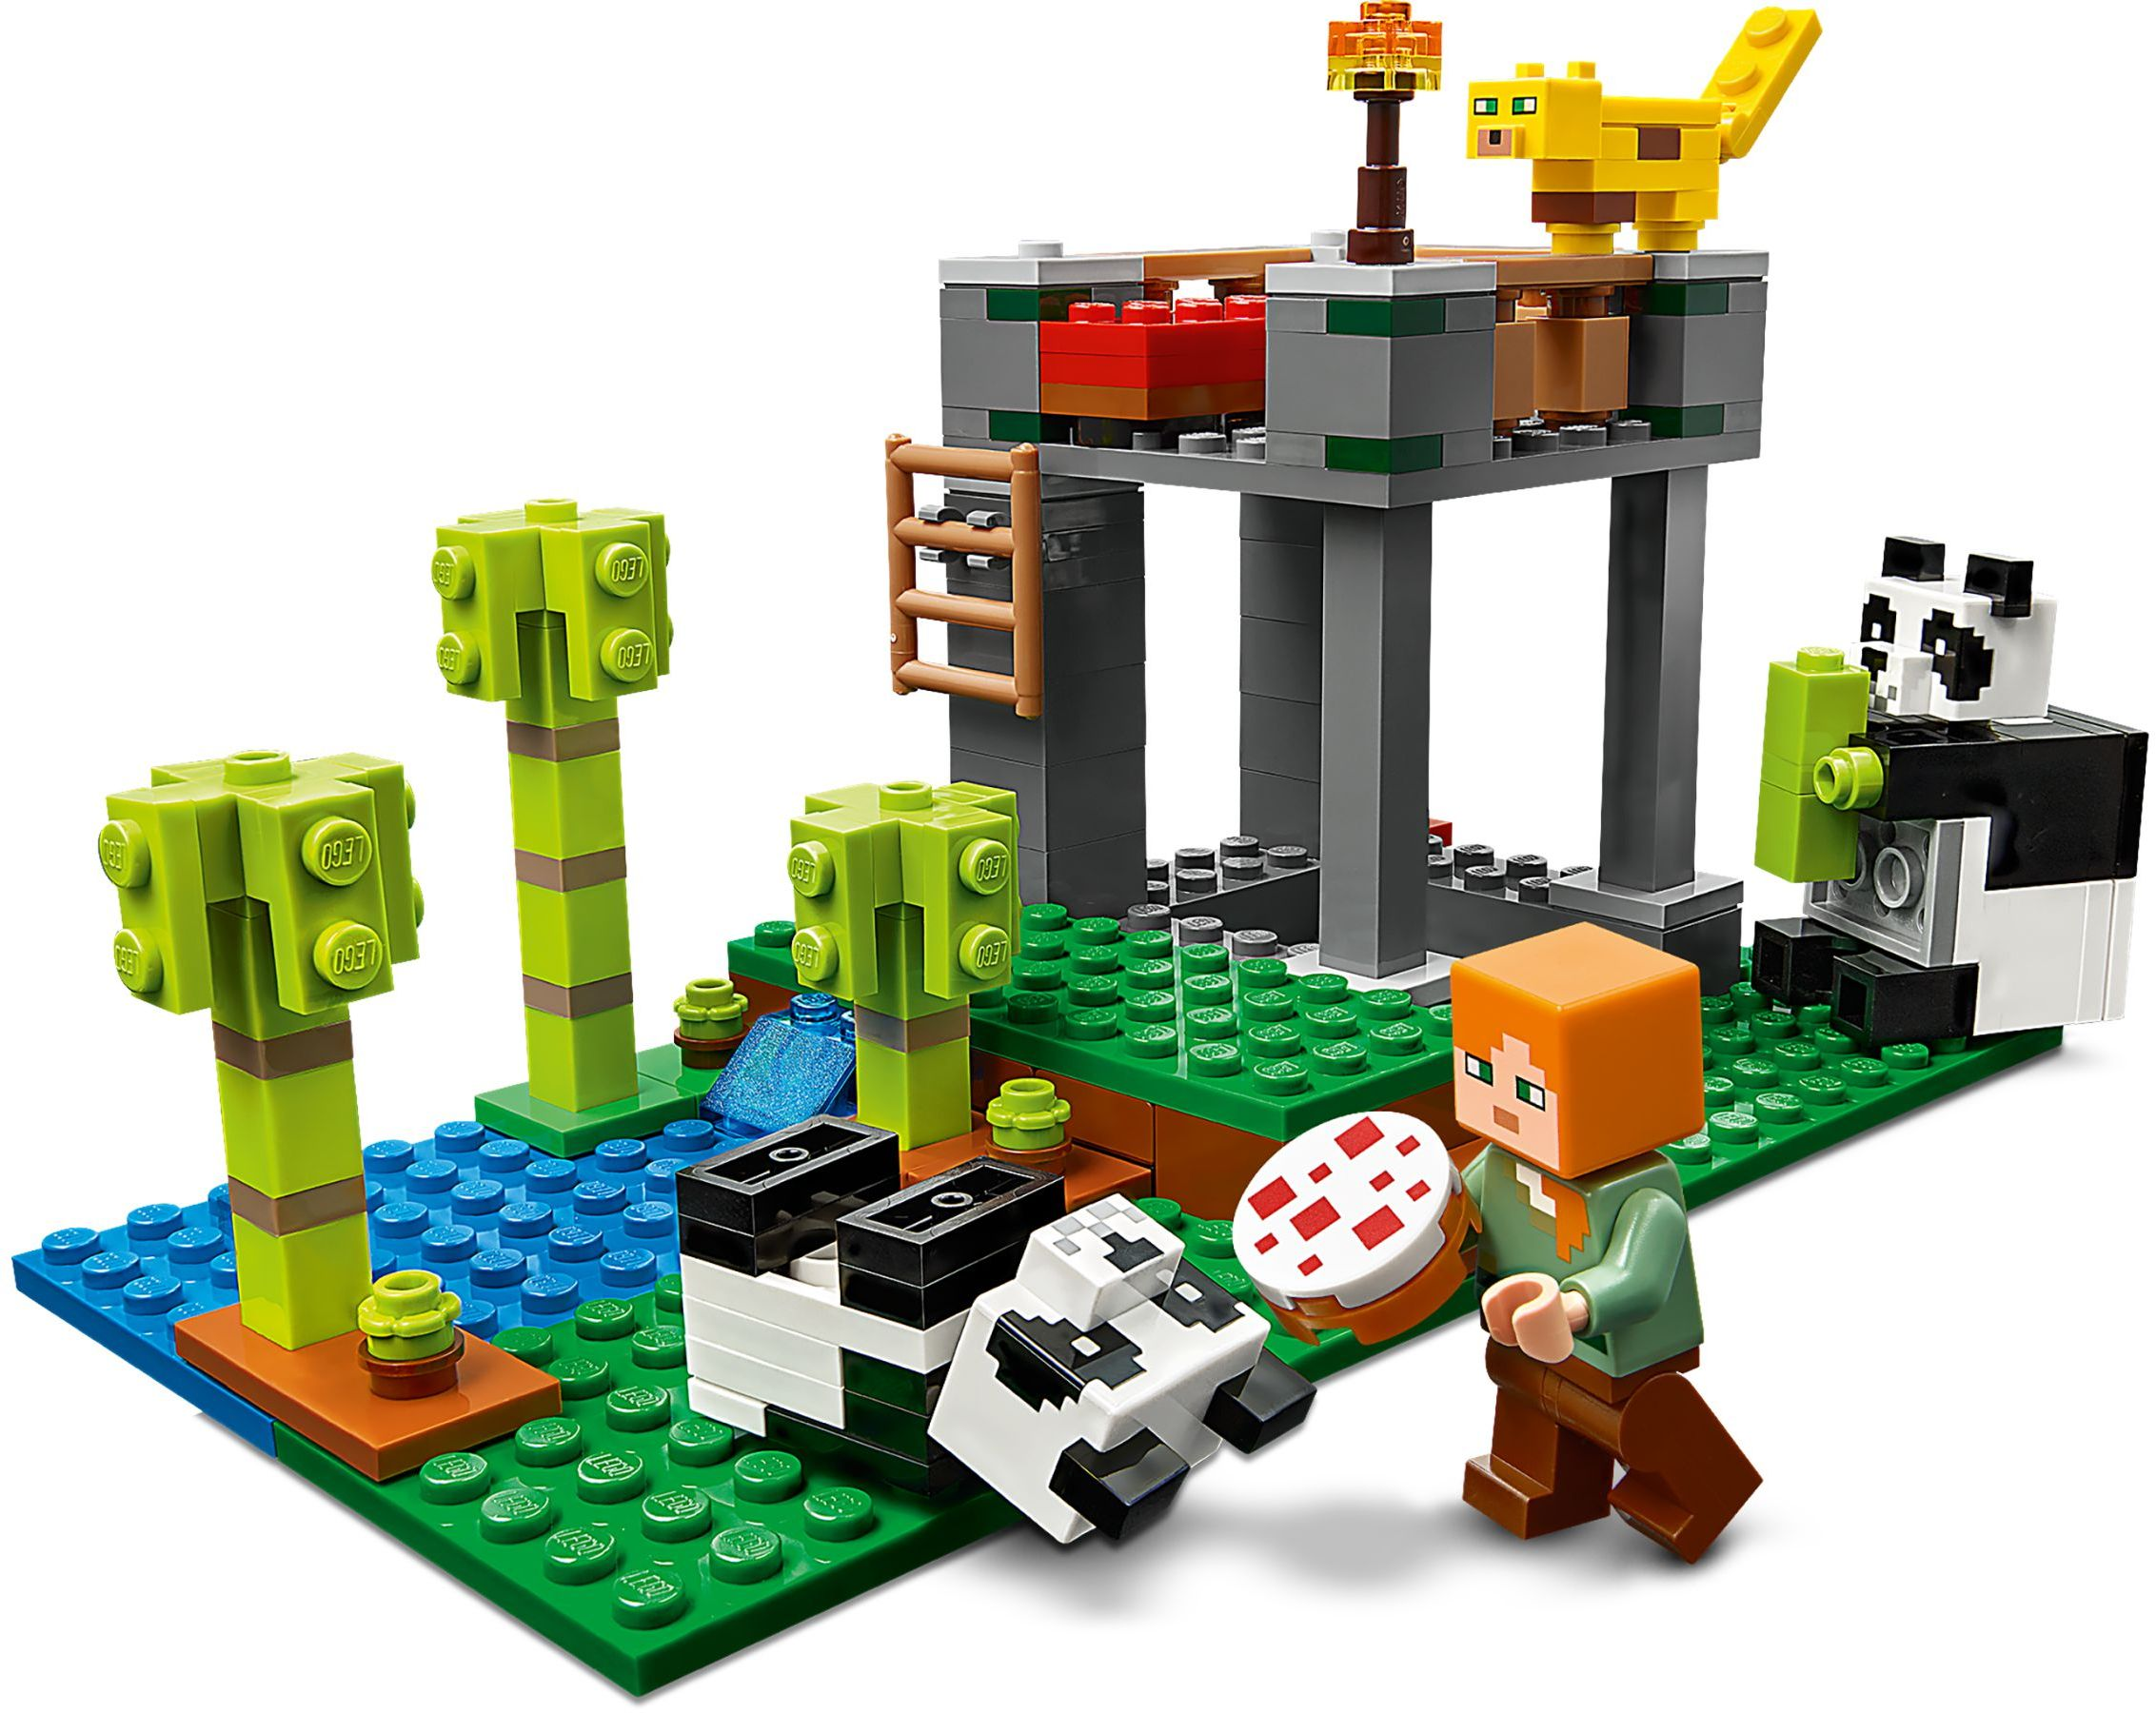 ❤️  21158 LEGO minecraft The Panda Nursery - Nơi nuôi dưỡng chú gấu Panda